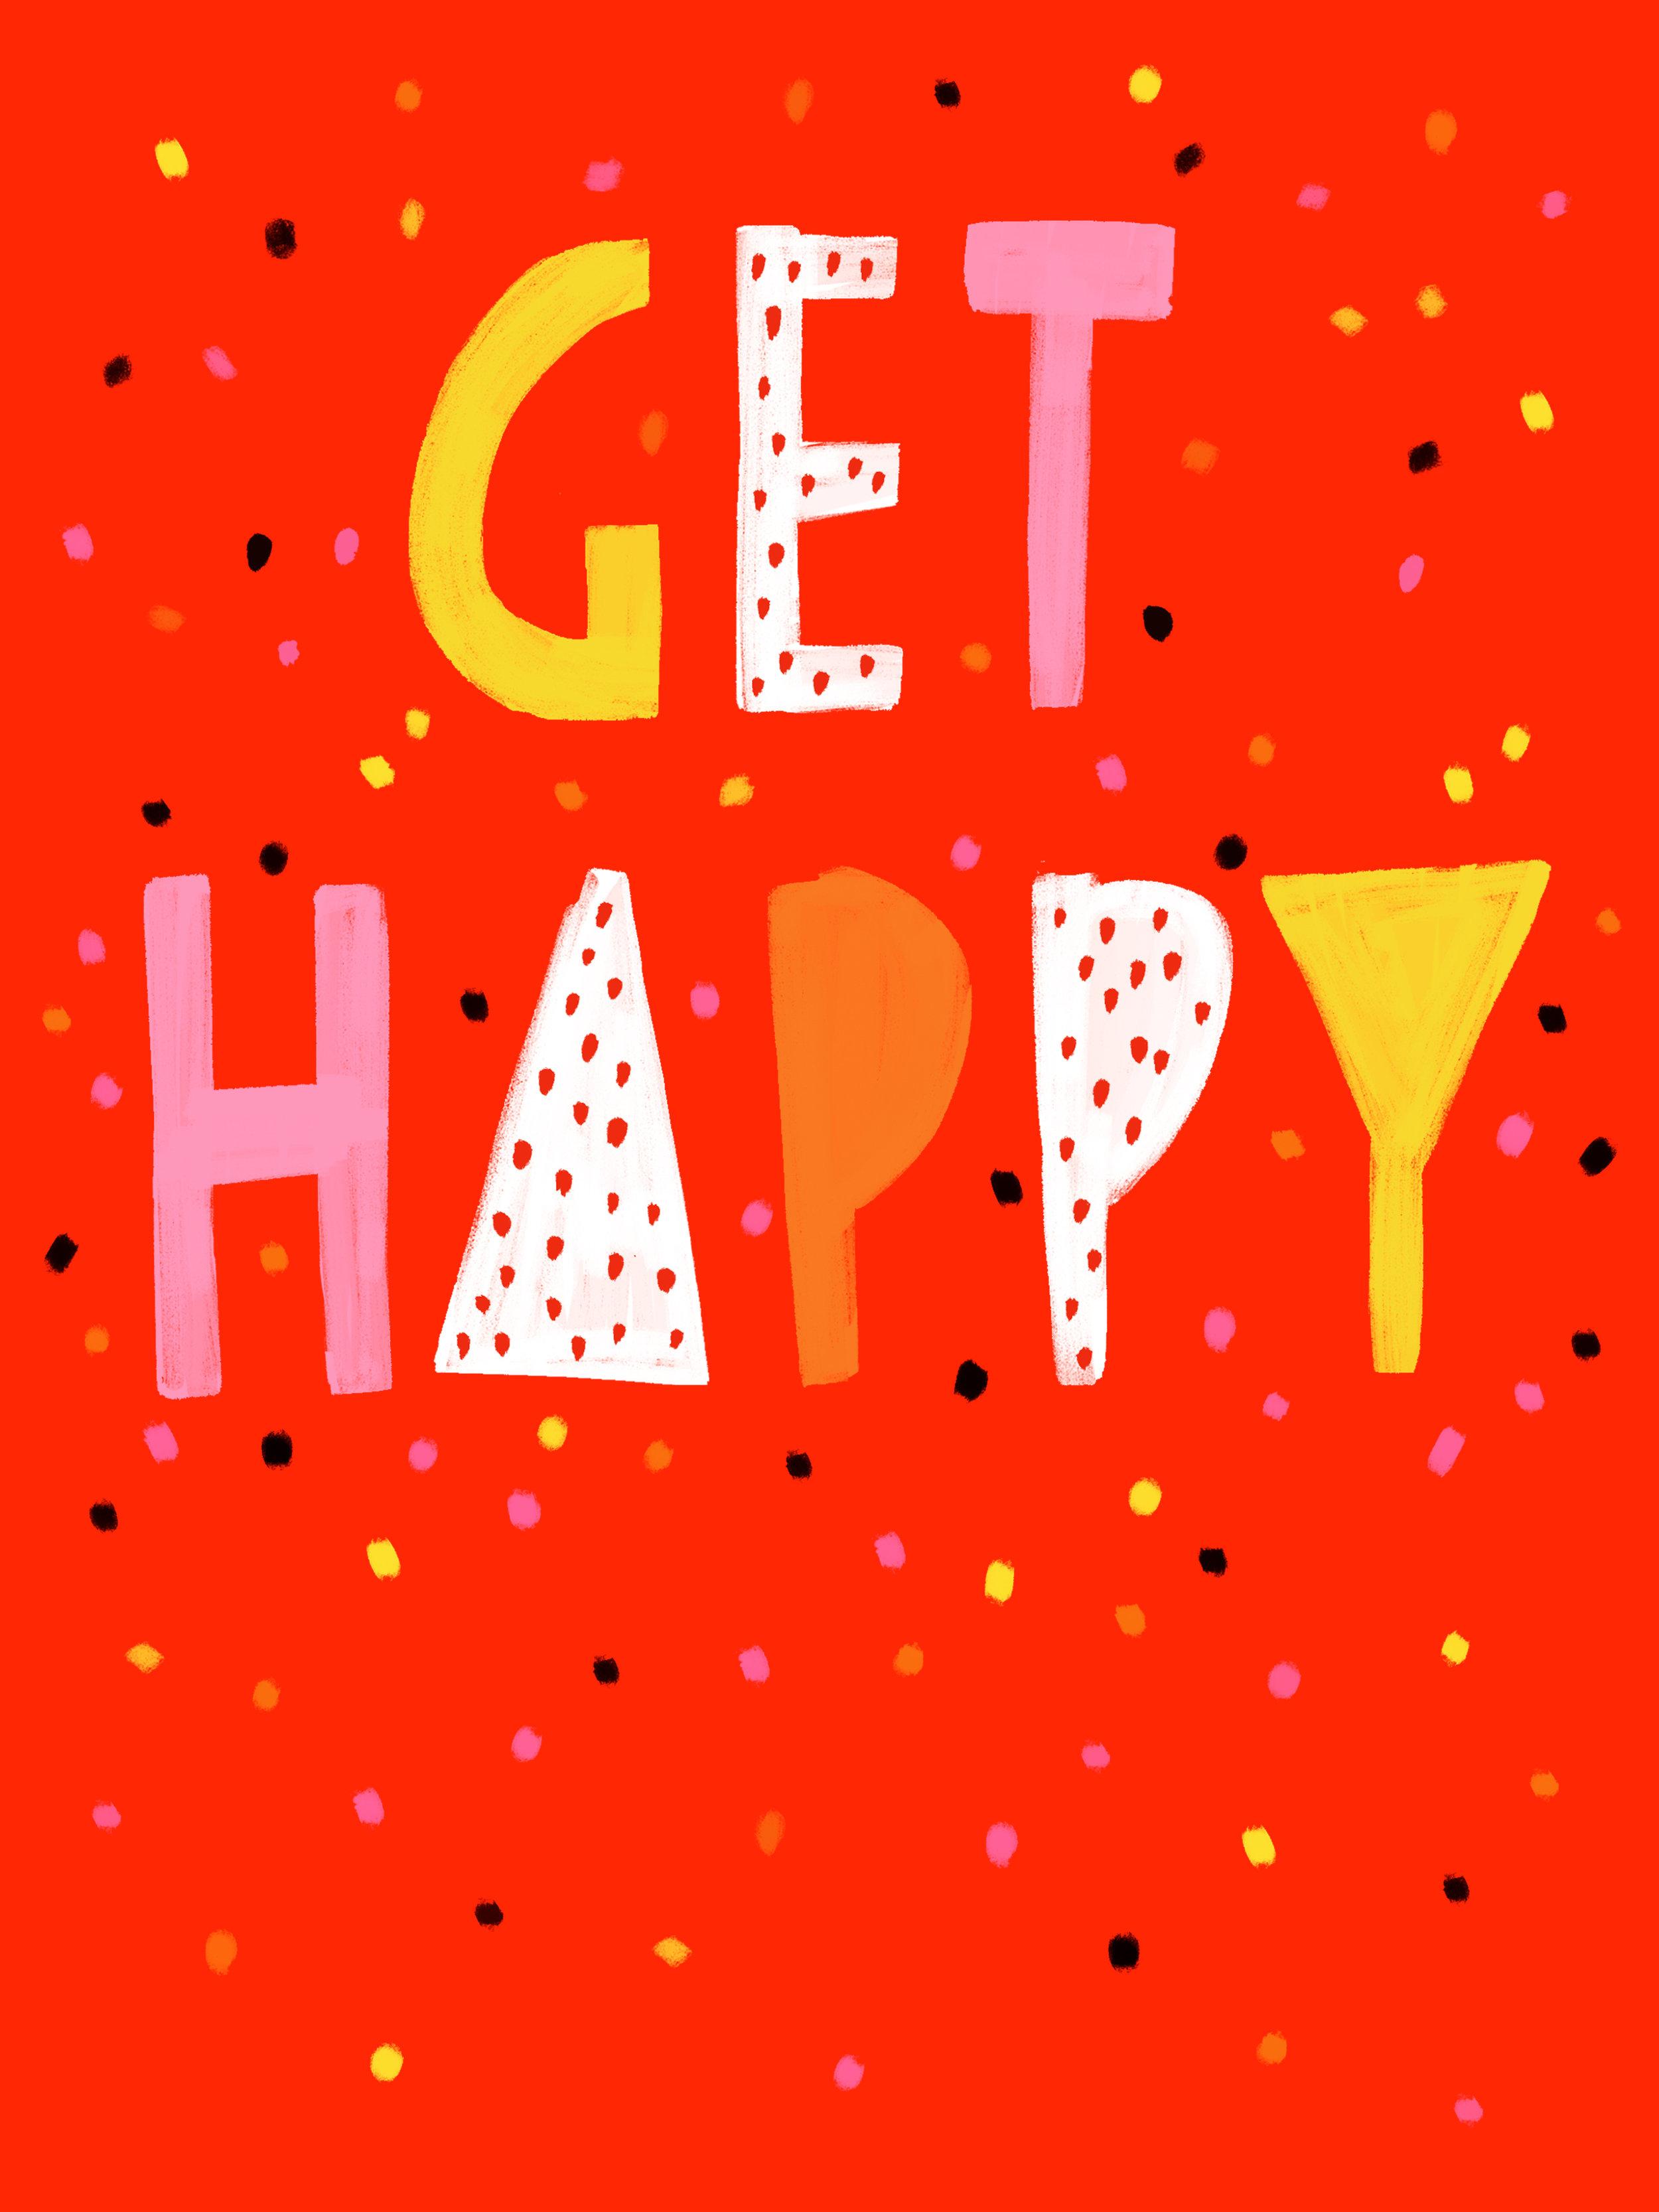 Get-Happy-Lettering.jpg